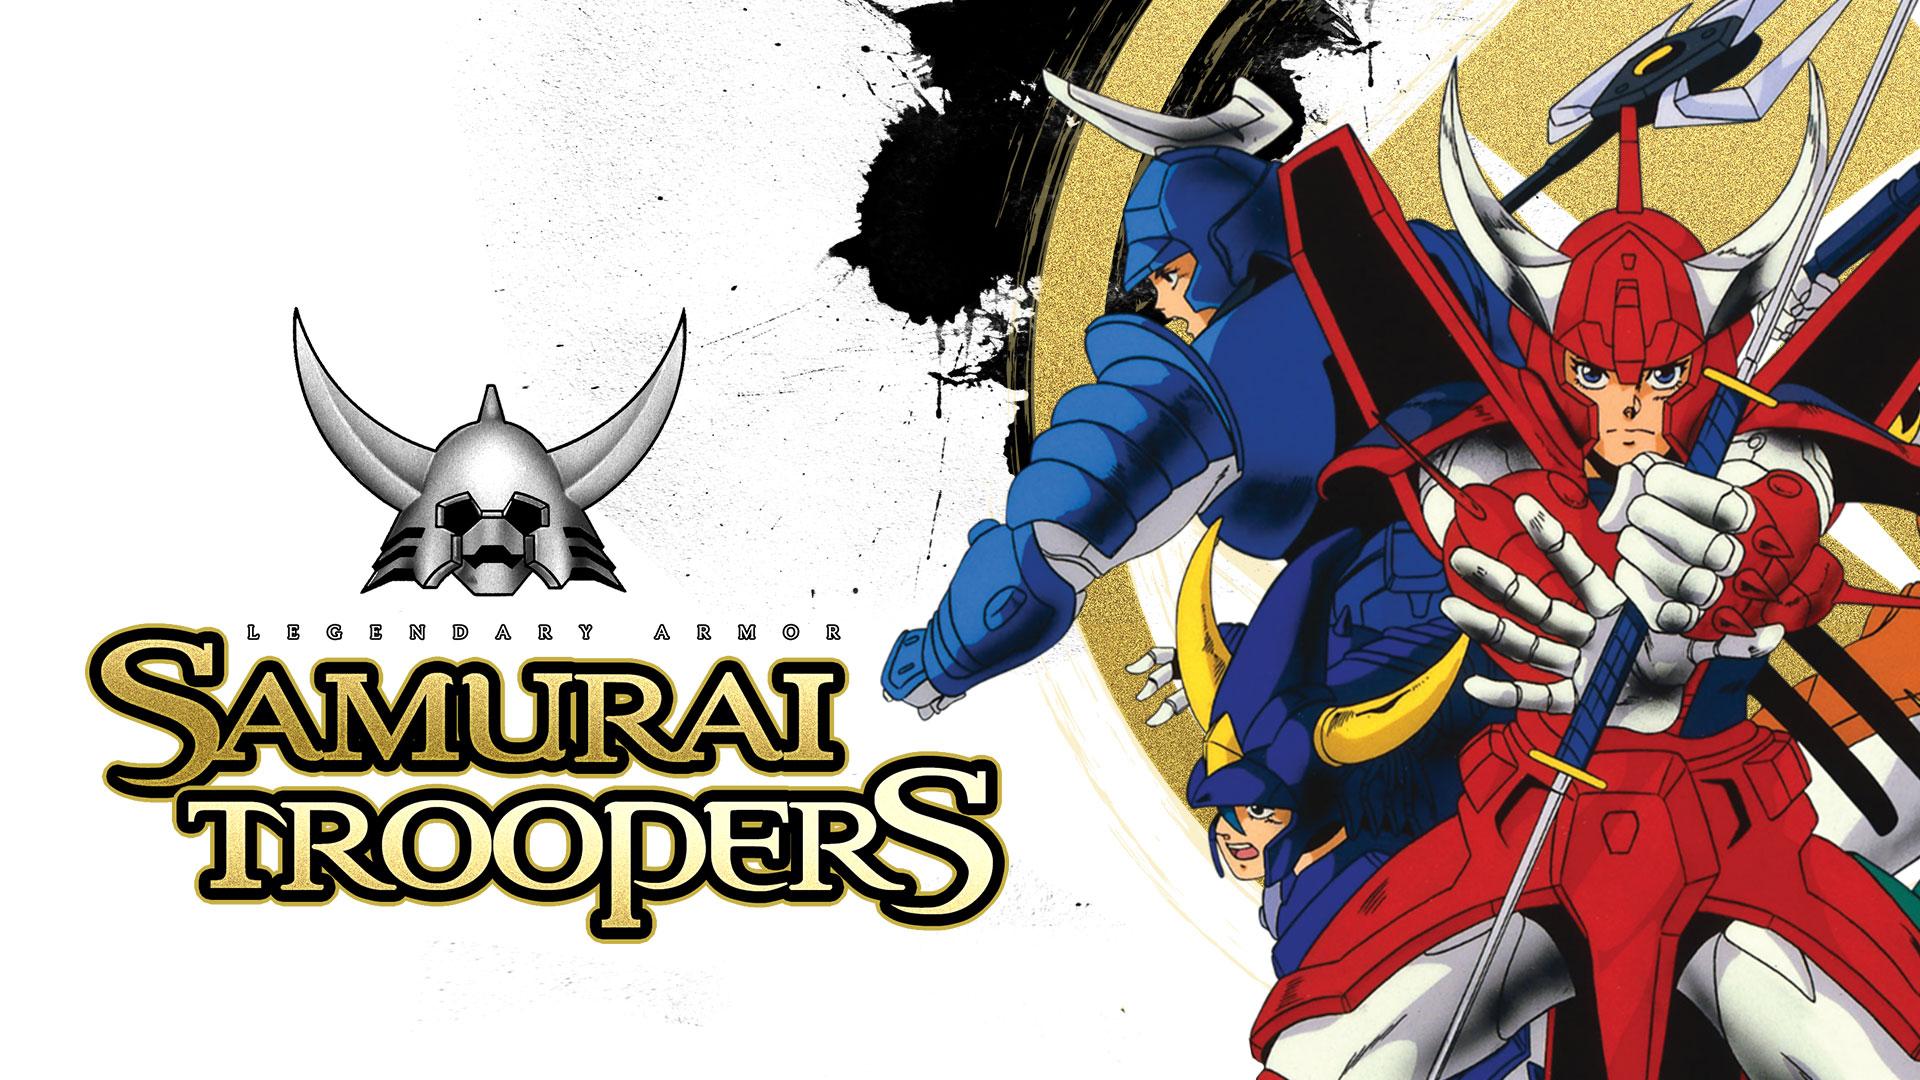 Samurai Troopers (Ronin Warriors)